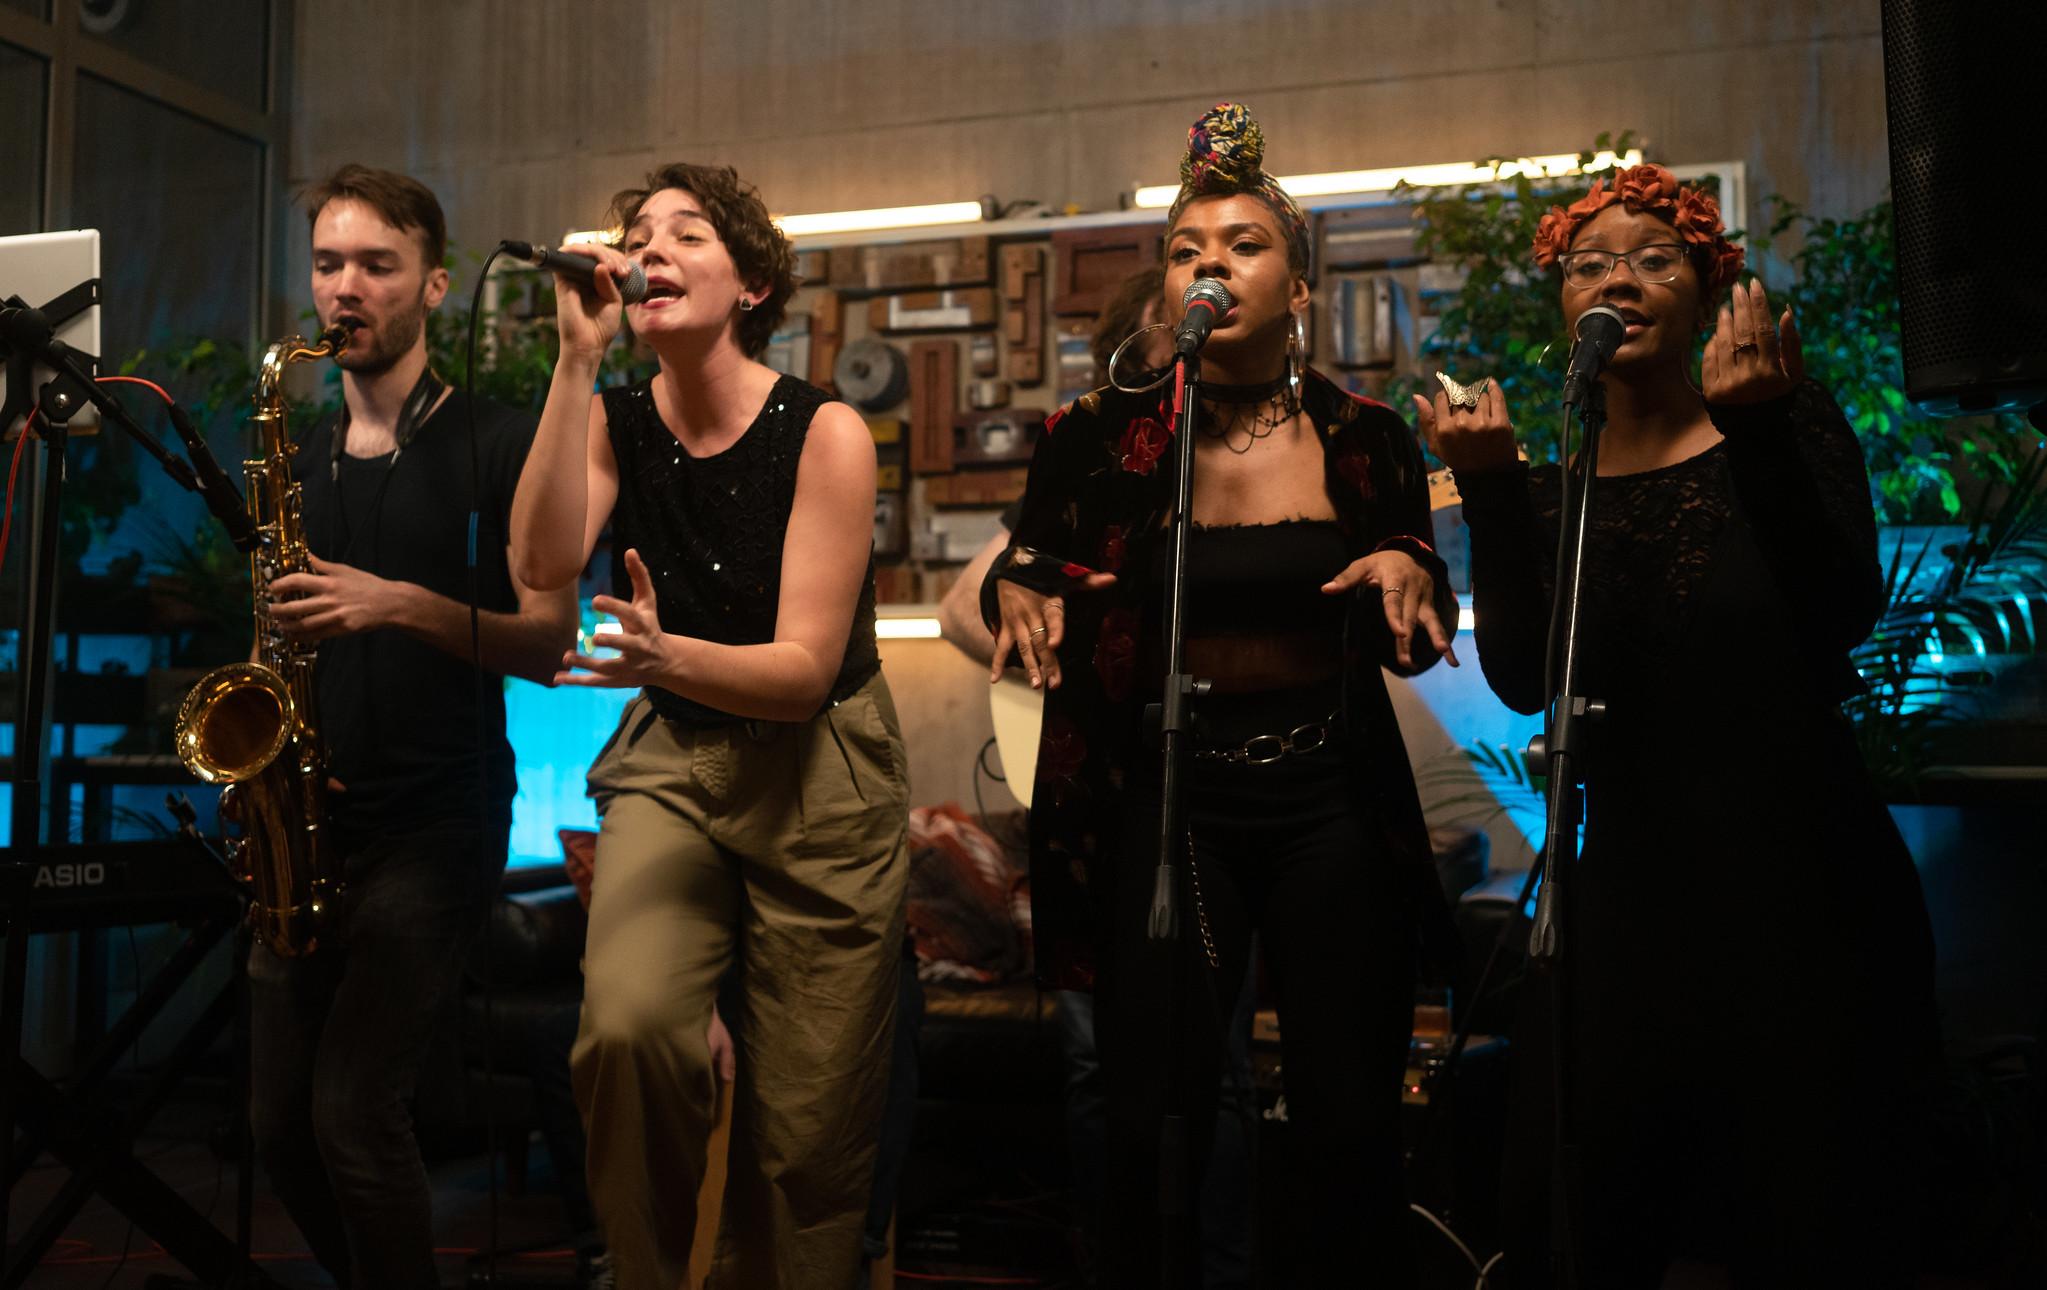 The Best of 2019 (So Far) | Sofar Sounds